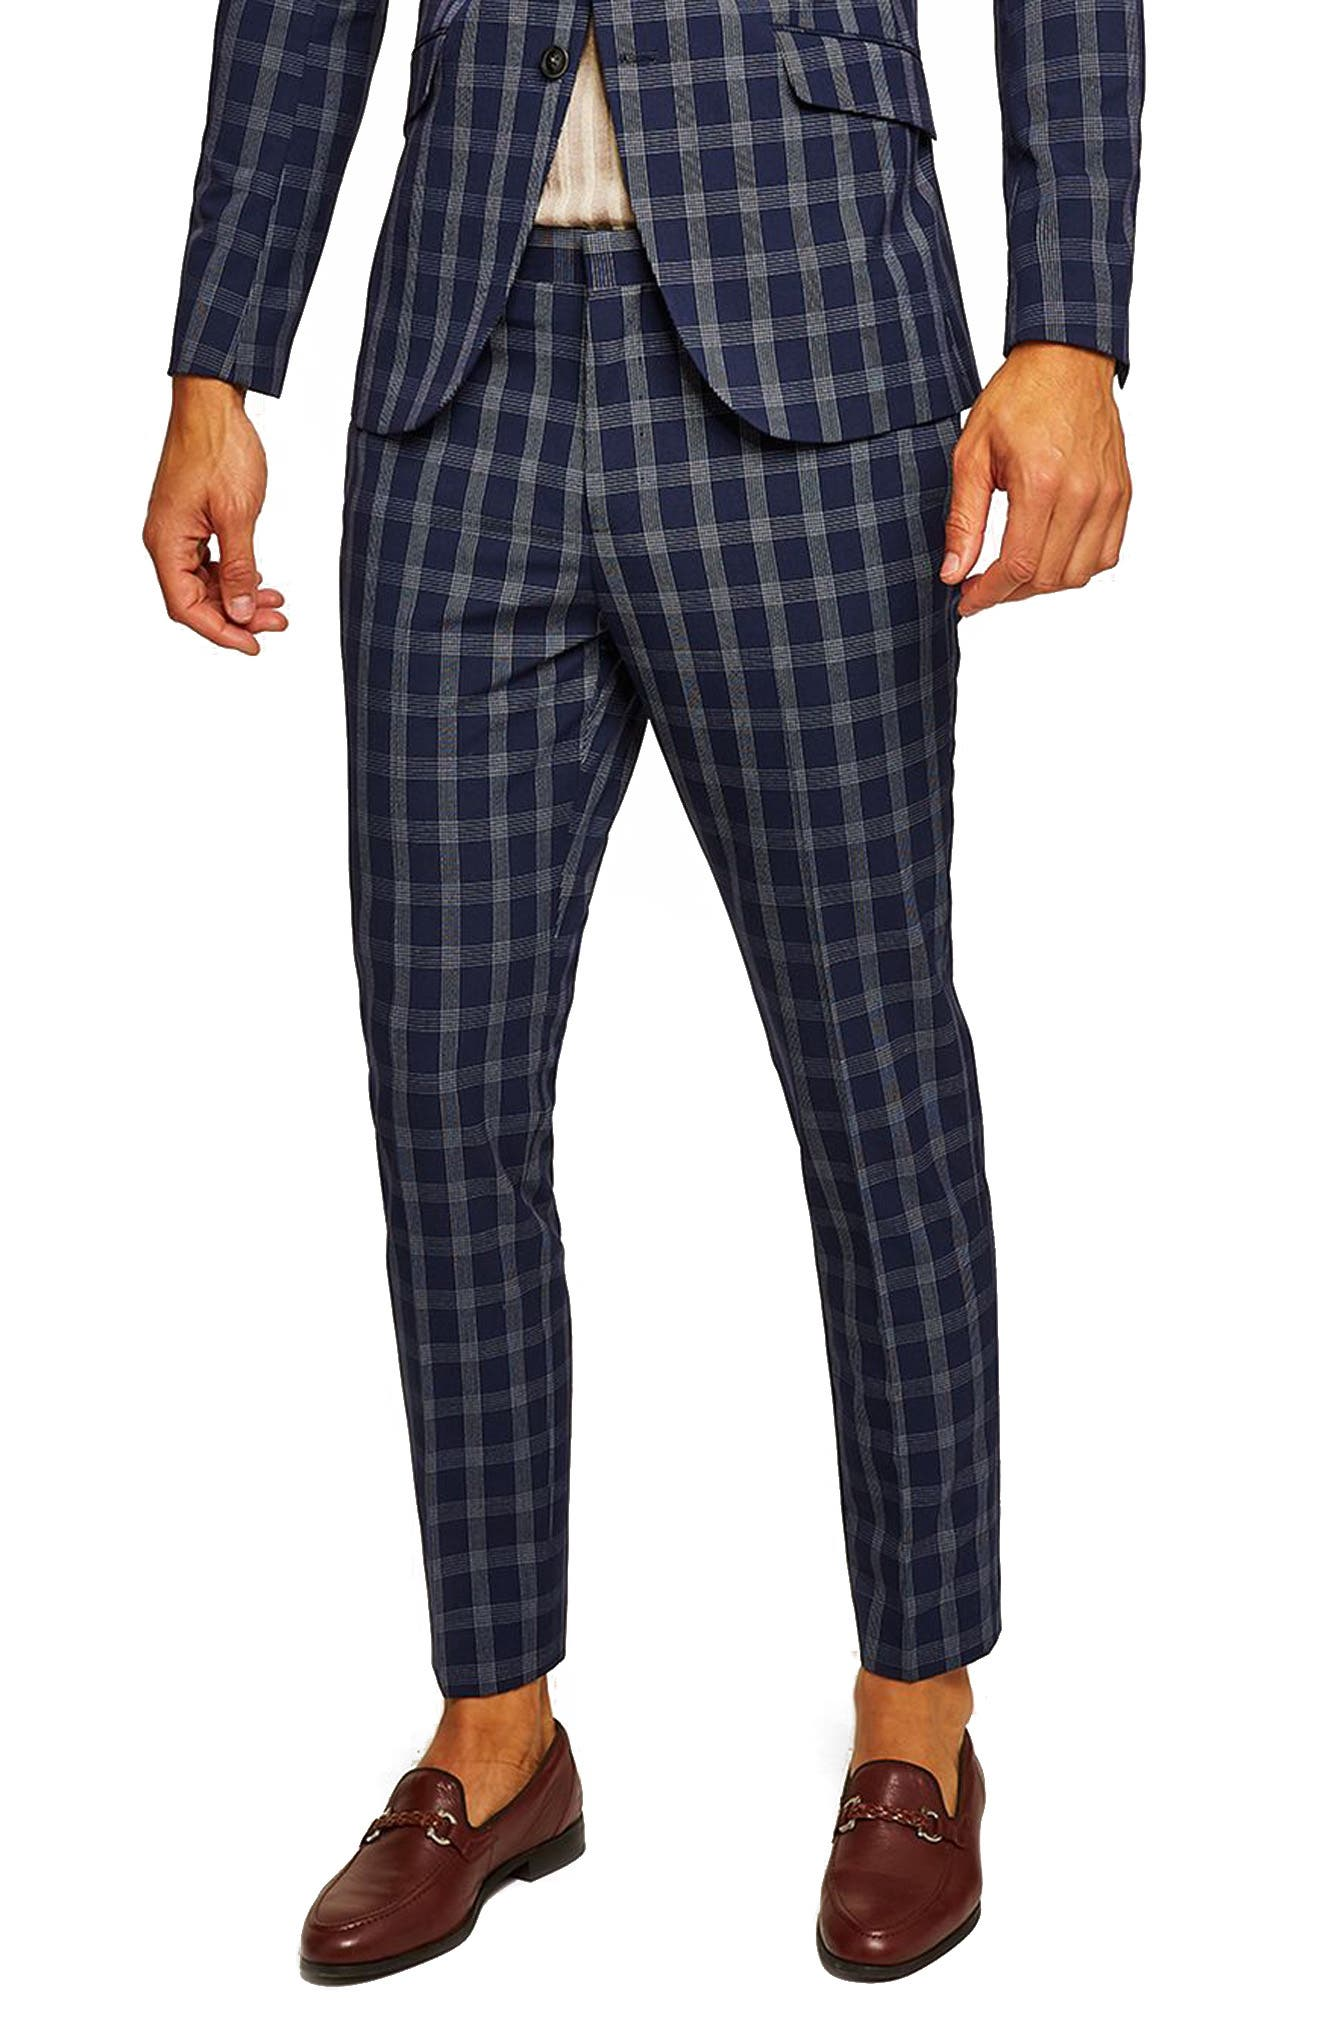 Muscle Fit Check Suit Trousers,                             Main thumbnail 1, color,                             NAVY BLUE MULTI